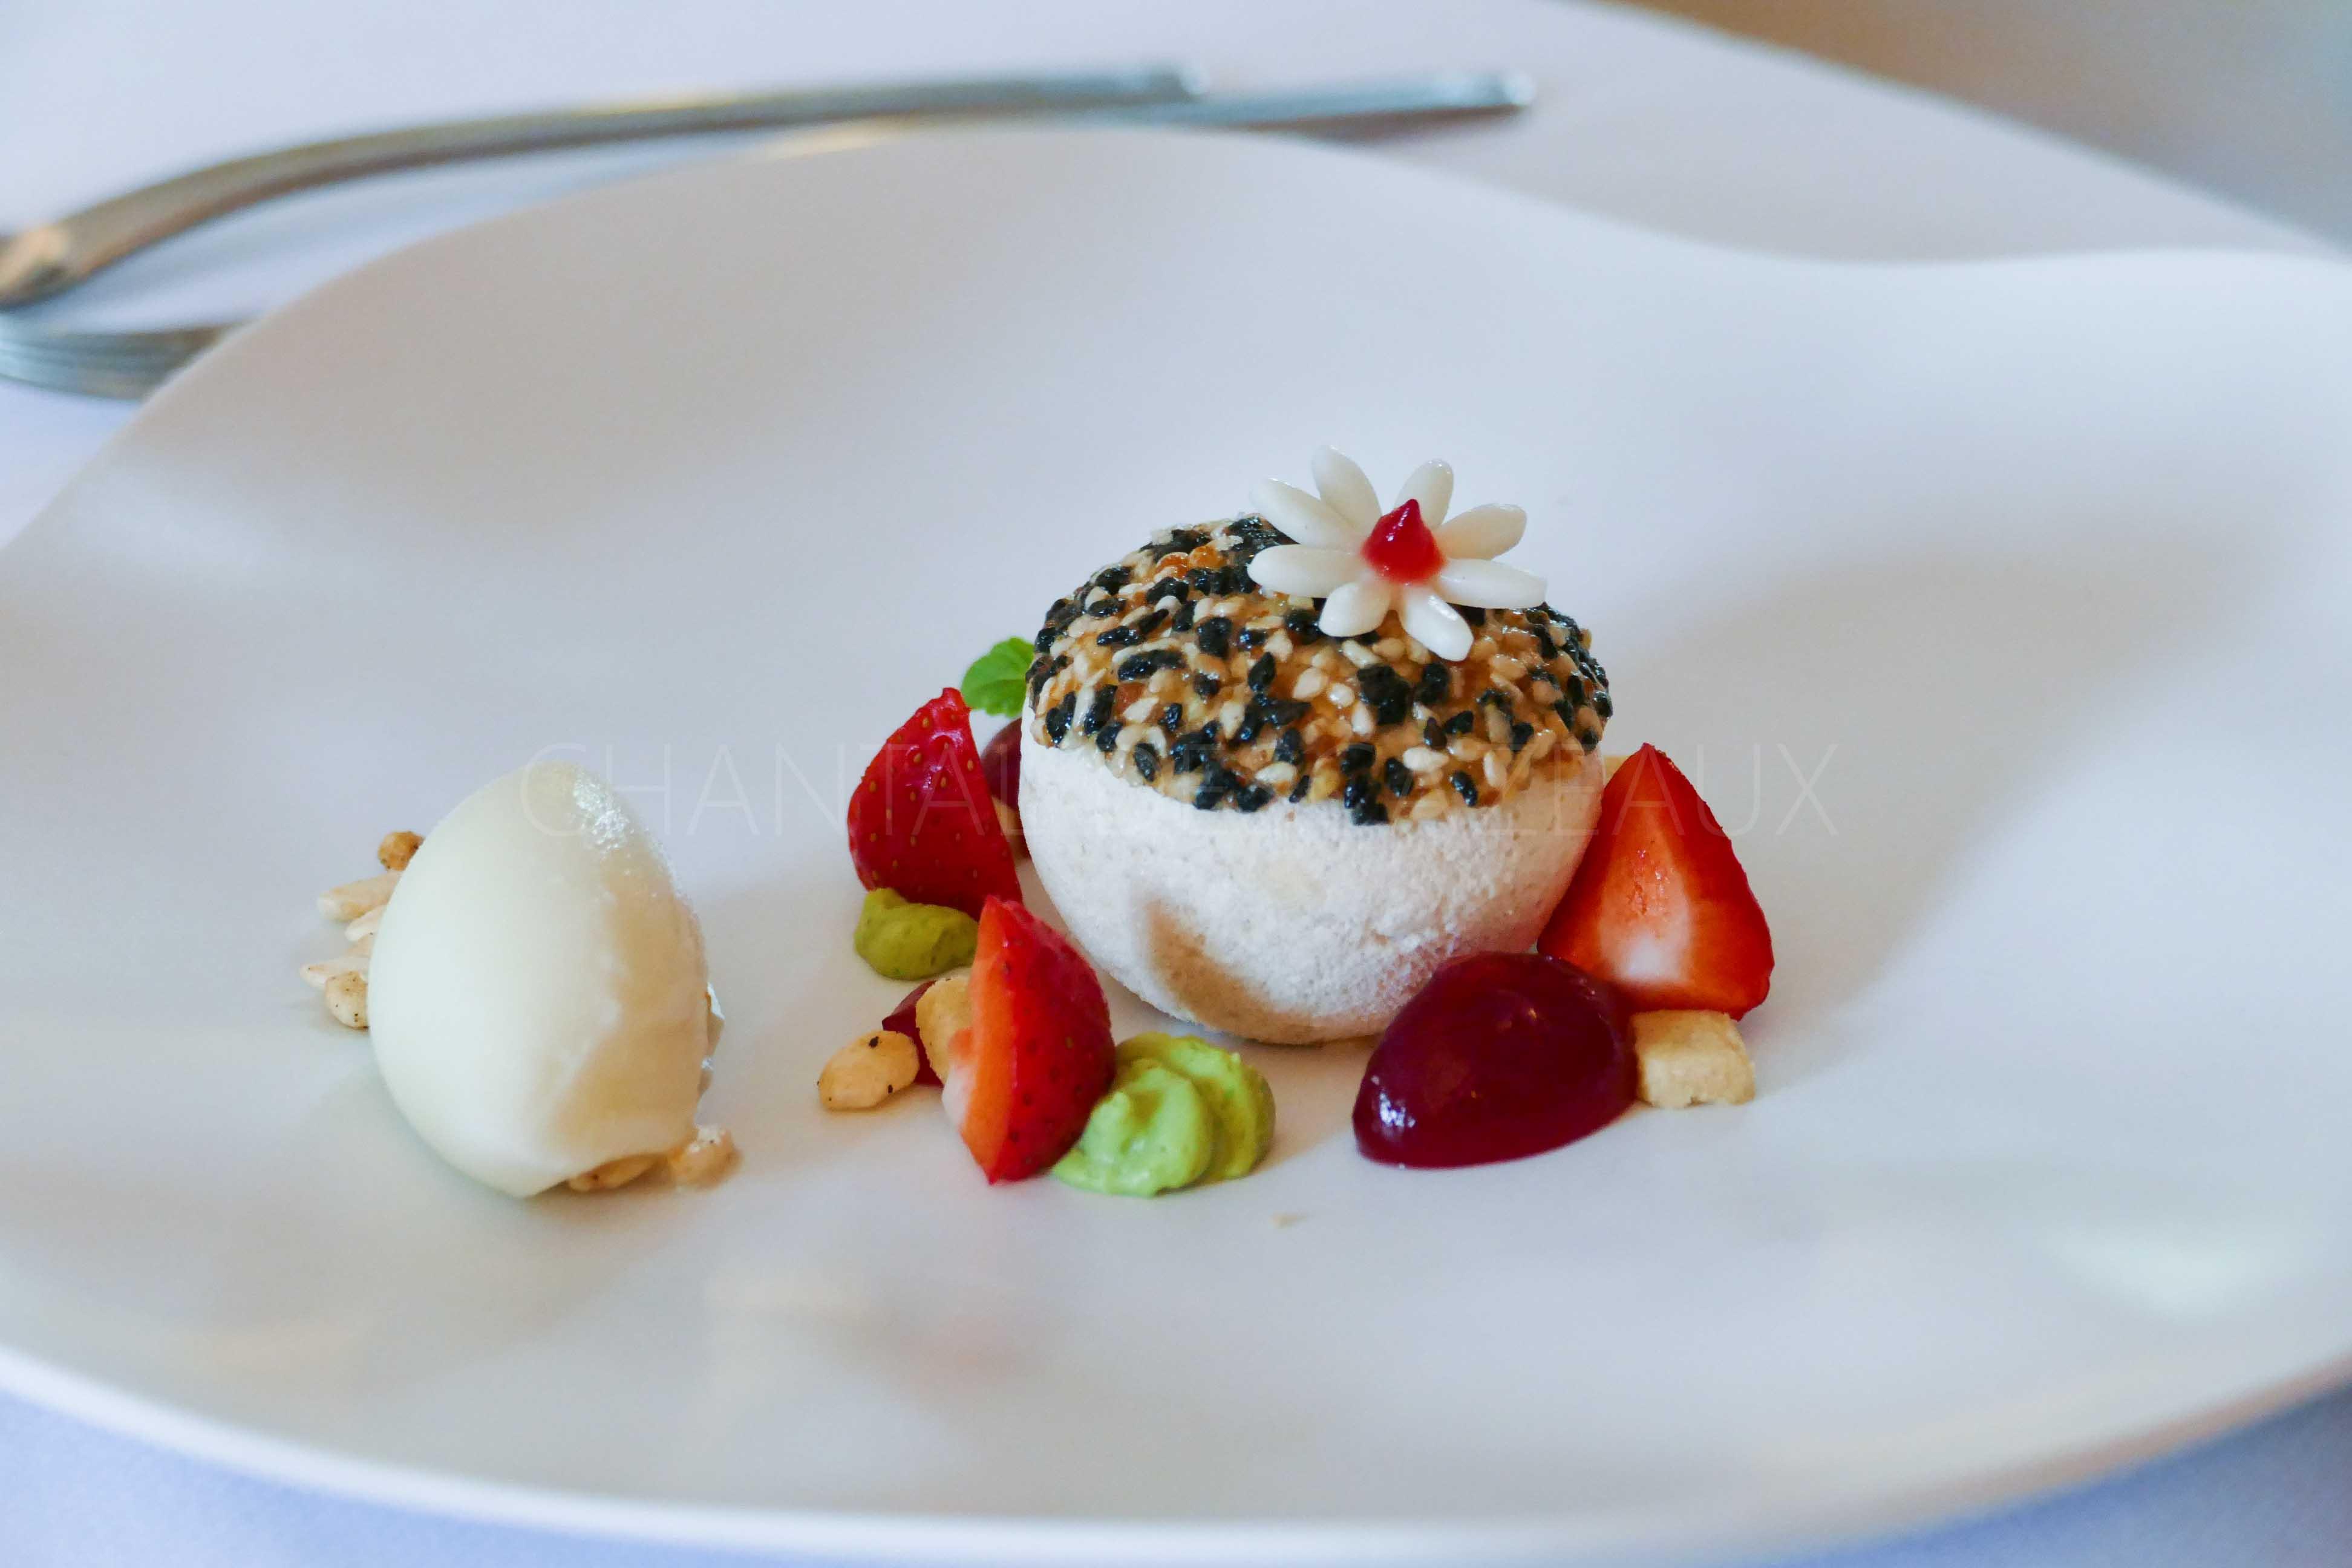 Dessert Manoir de la Boulaie